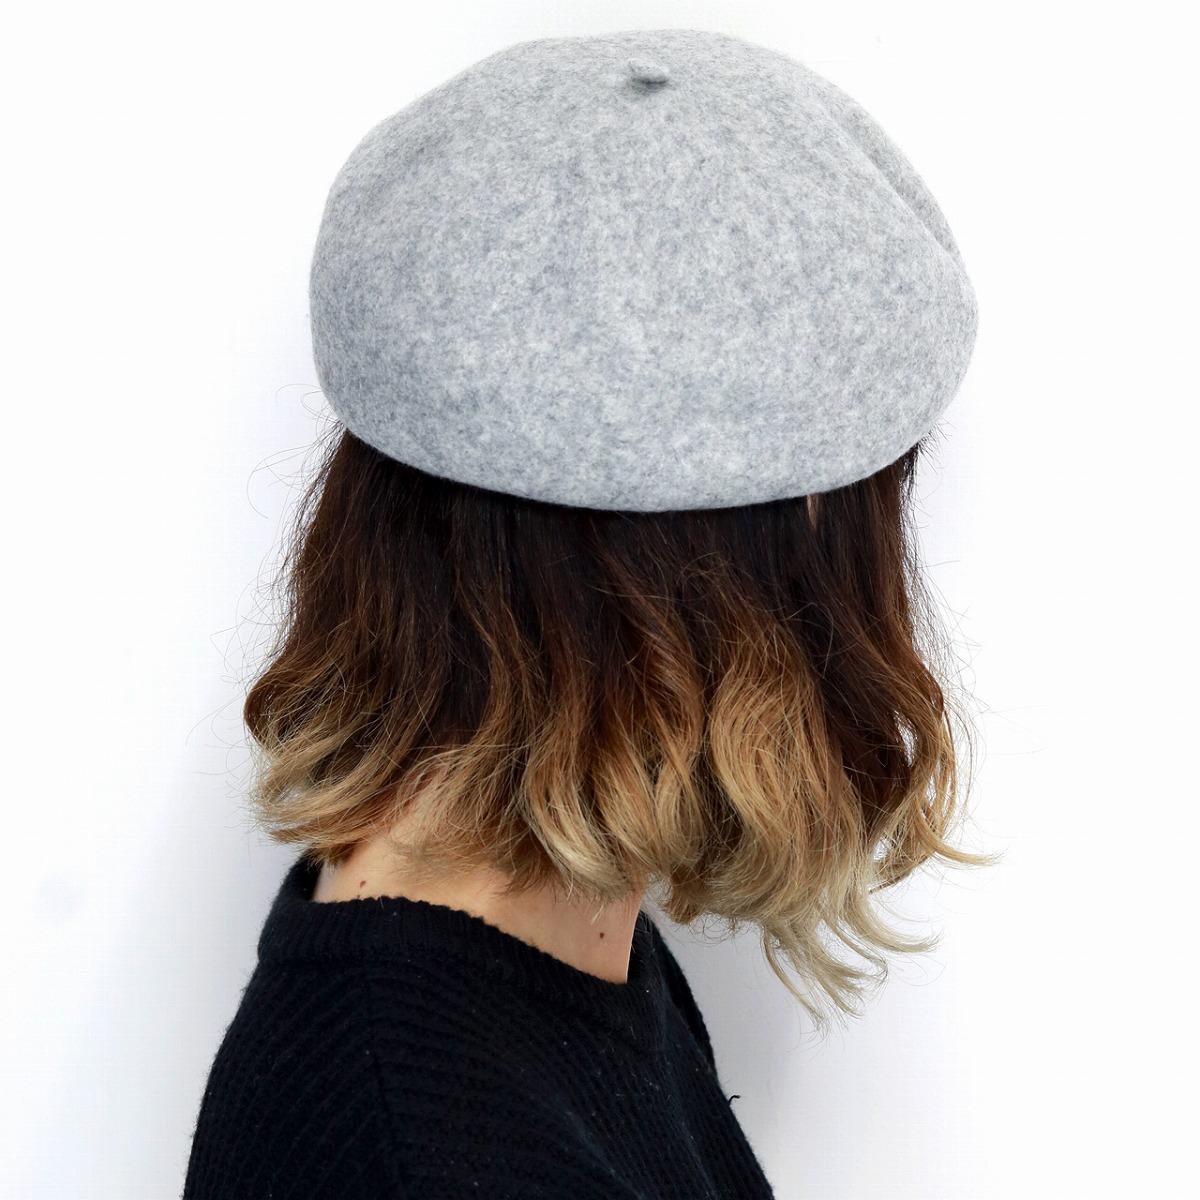 Lady s beret plain fabric felt Basque beret small-sized hat men adjustable  size small shark beret hair beret hat Shin pull unisex fashion autumn  coordinates ... f8d8203f0536